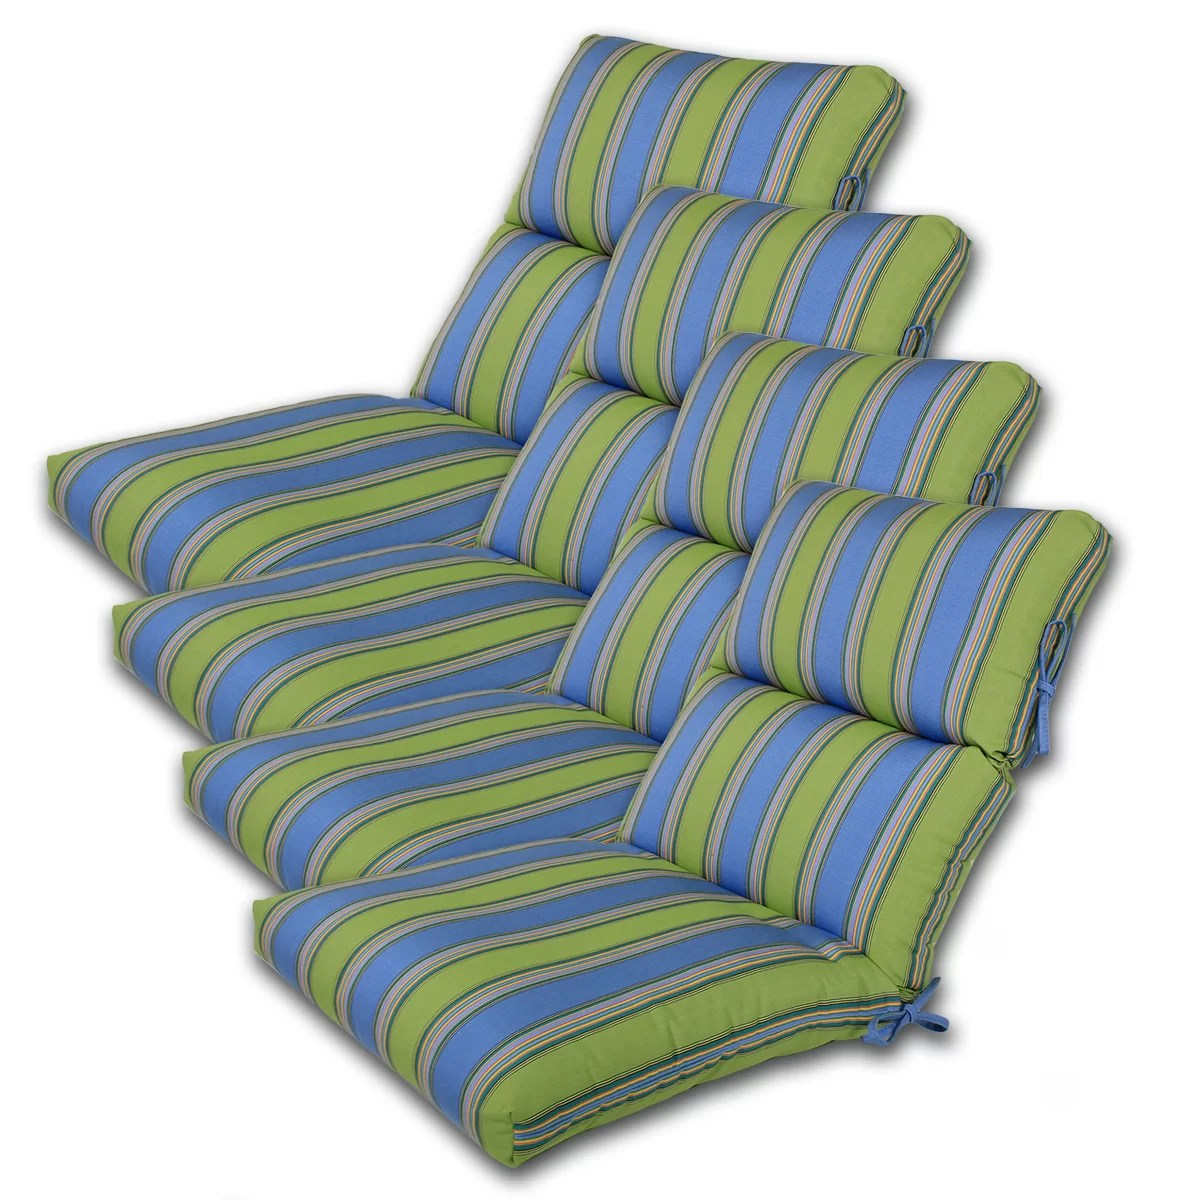 Highland Dunes Indoor Outdoor Sunbrella Chair Cushion Reviews Wayfair Ca